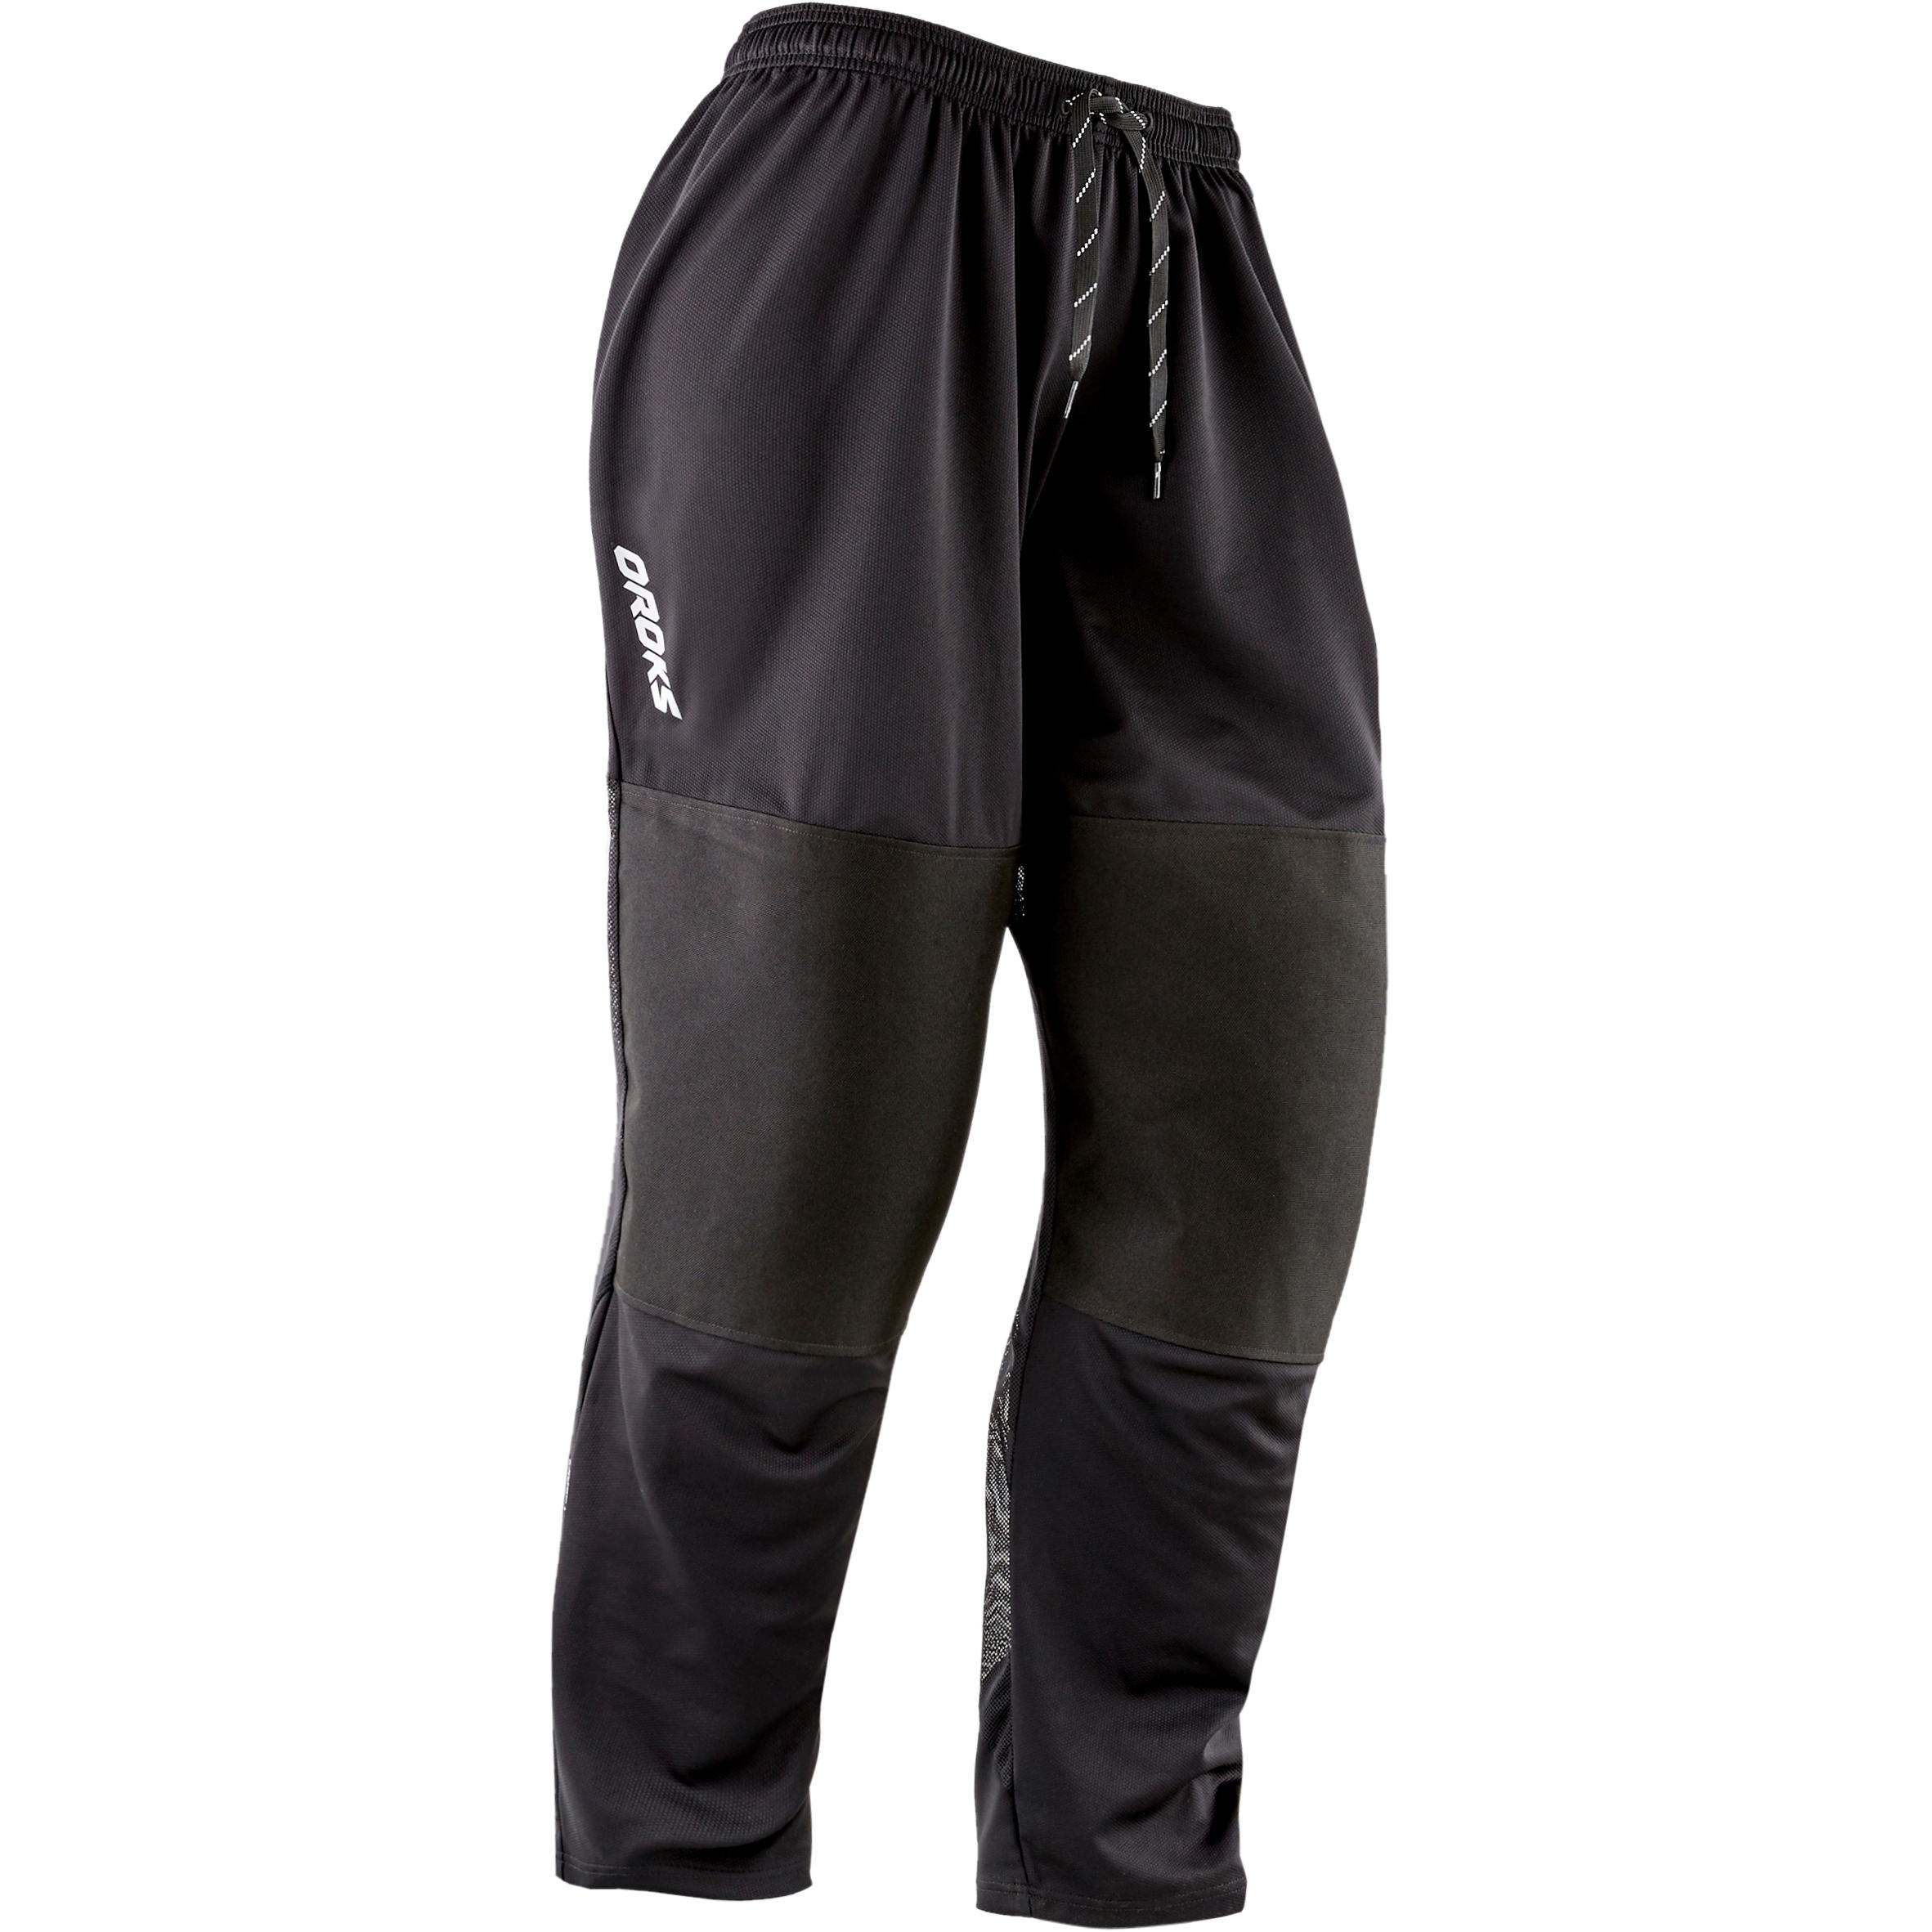 Pantalon hochei role ILH500 SR imagine